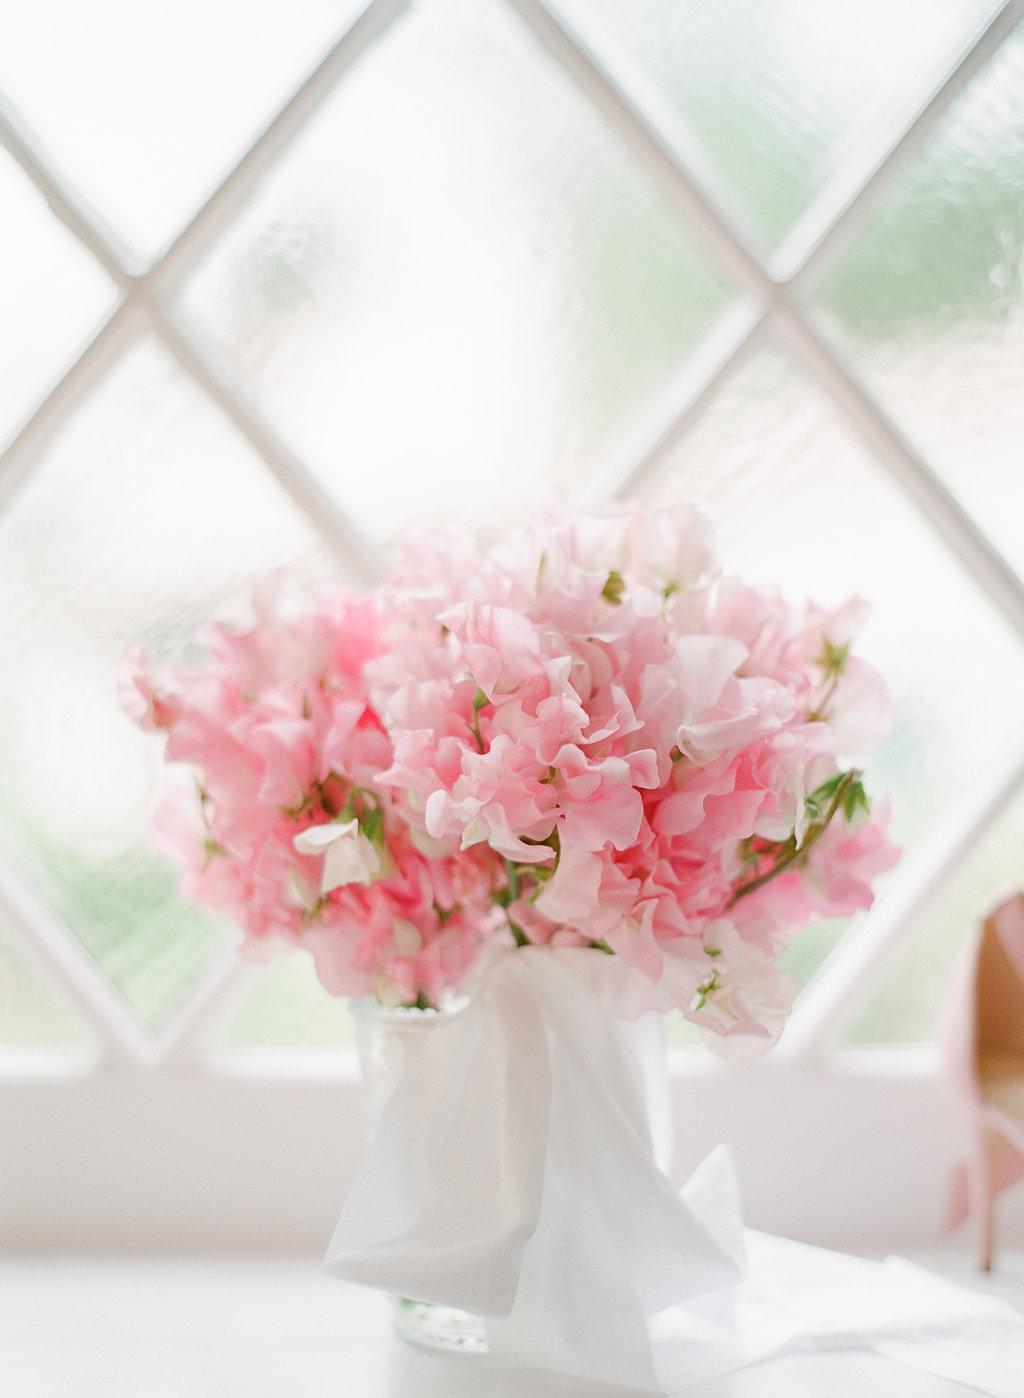 santa-barbara-elopement-wedding-planning-planner-coordinator-day-of-week-small-wedding-el-encanto-lily-pond-pink-kids-garden-riviera-elope-design-estate-candle (3).jpg